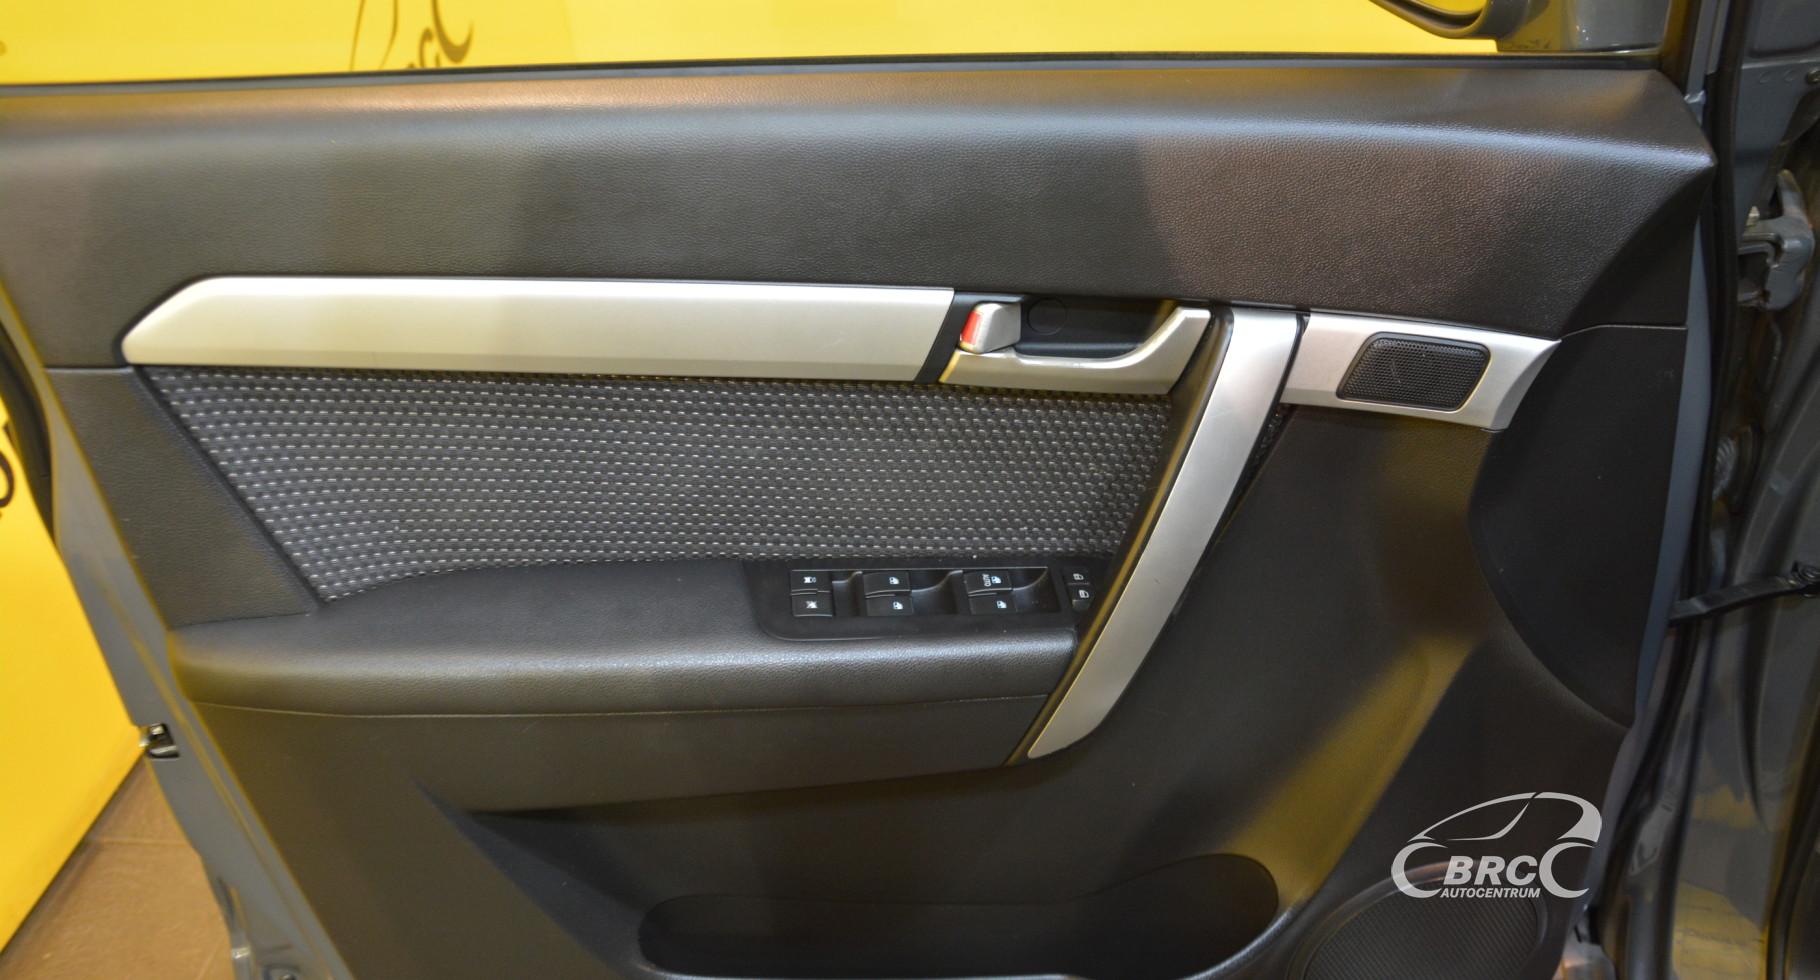 Chevrolet Captiva 2.2 TD 2WD